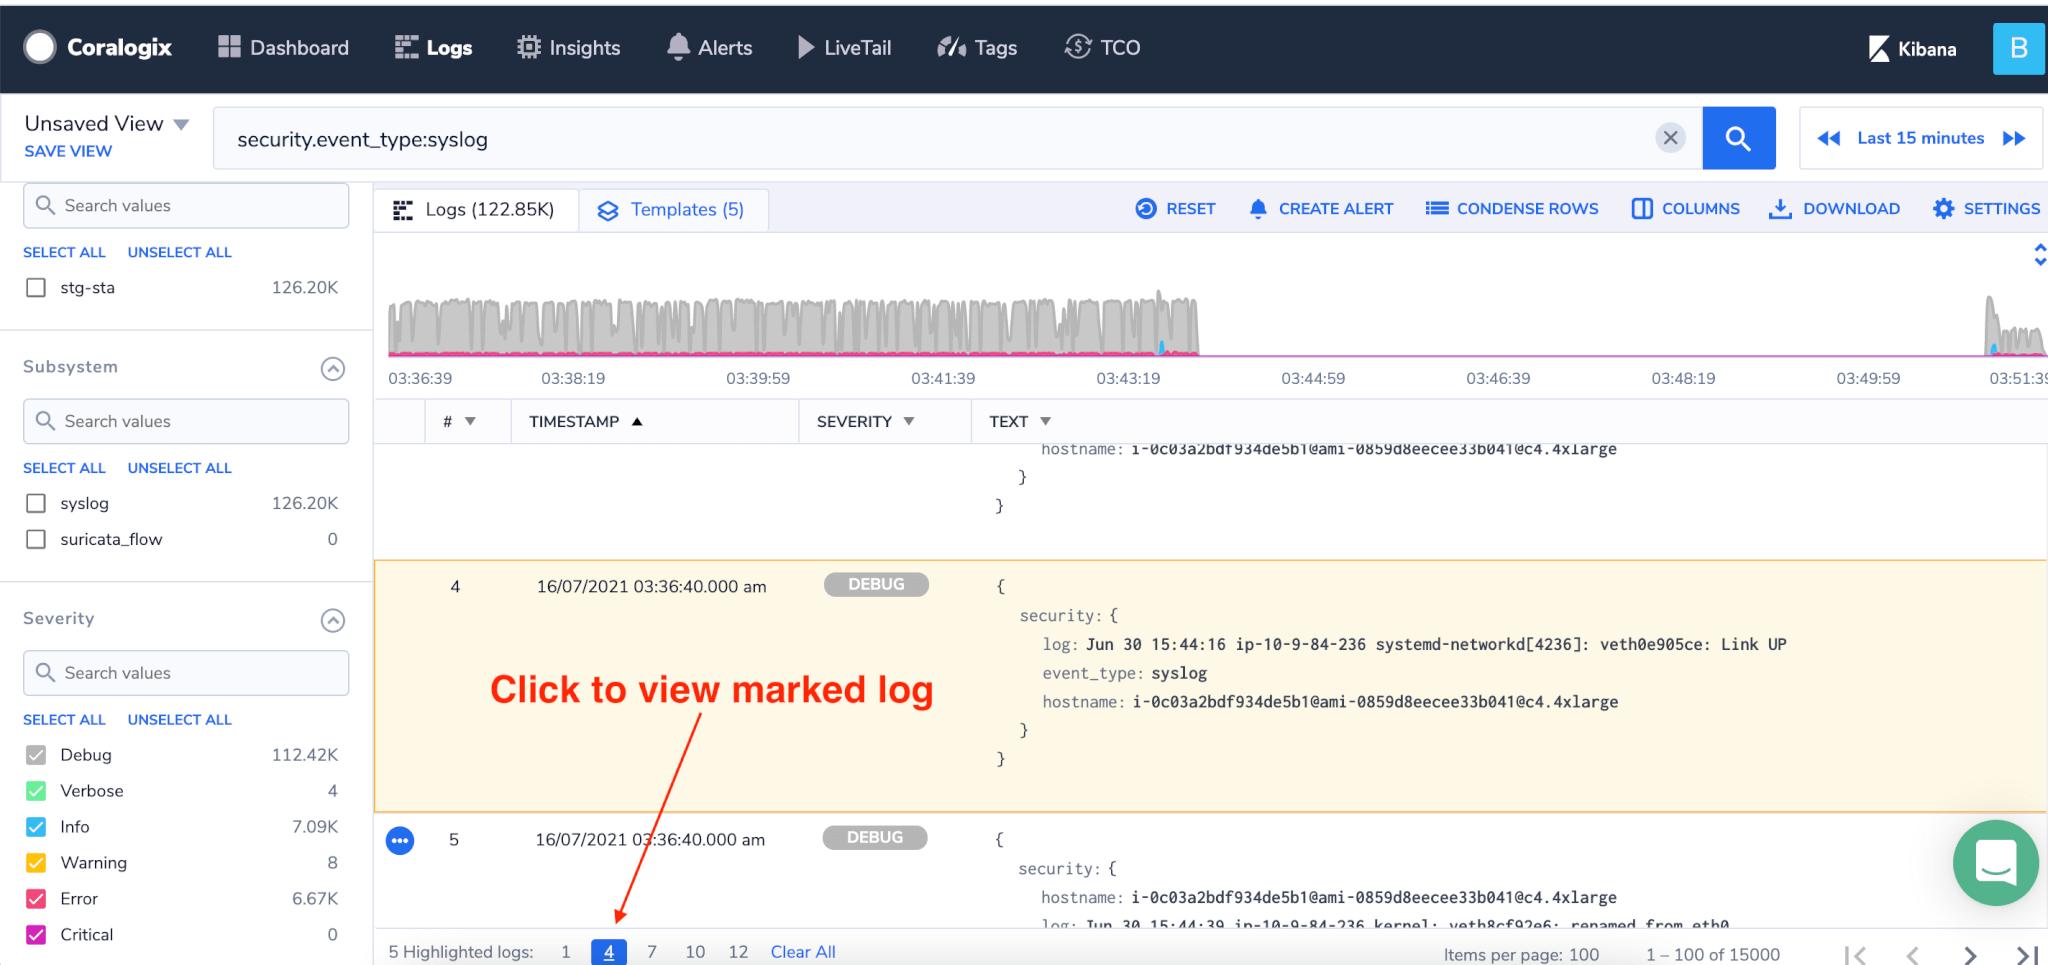 log screen navigate to highlighted log